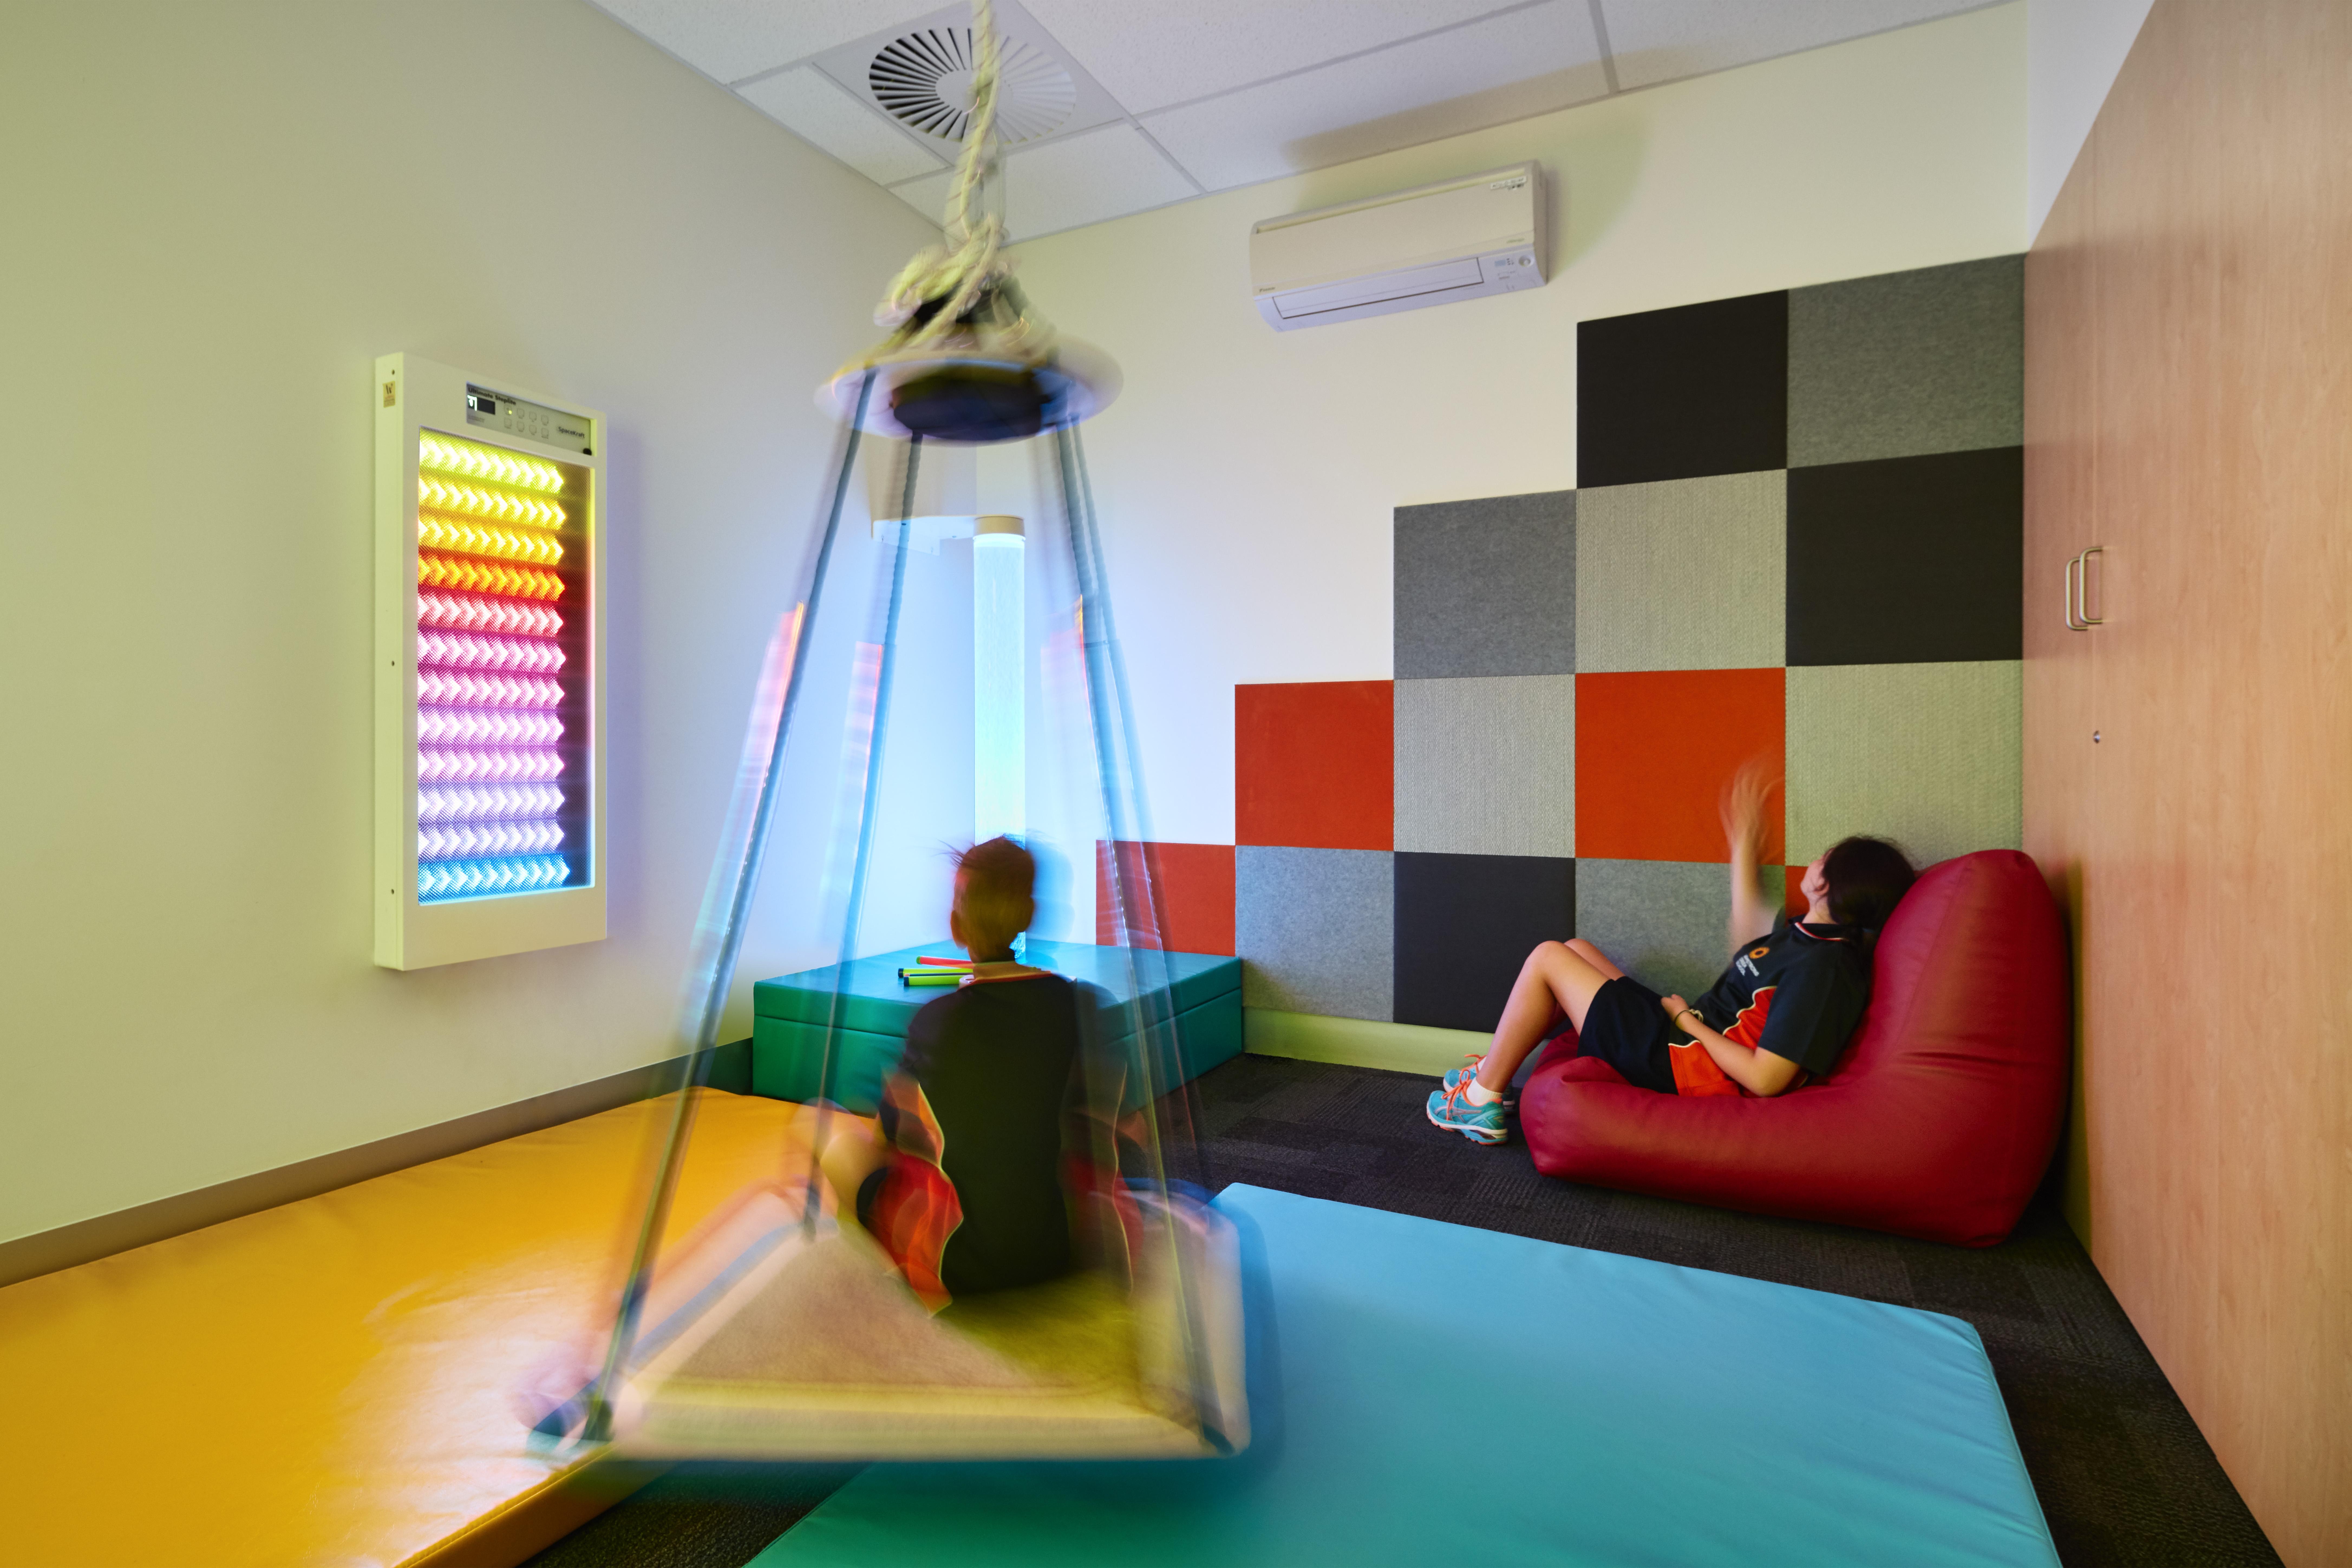 clarkehopkinsclarke inclusive school design